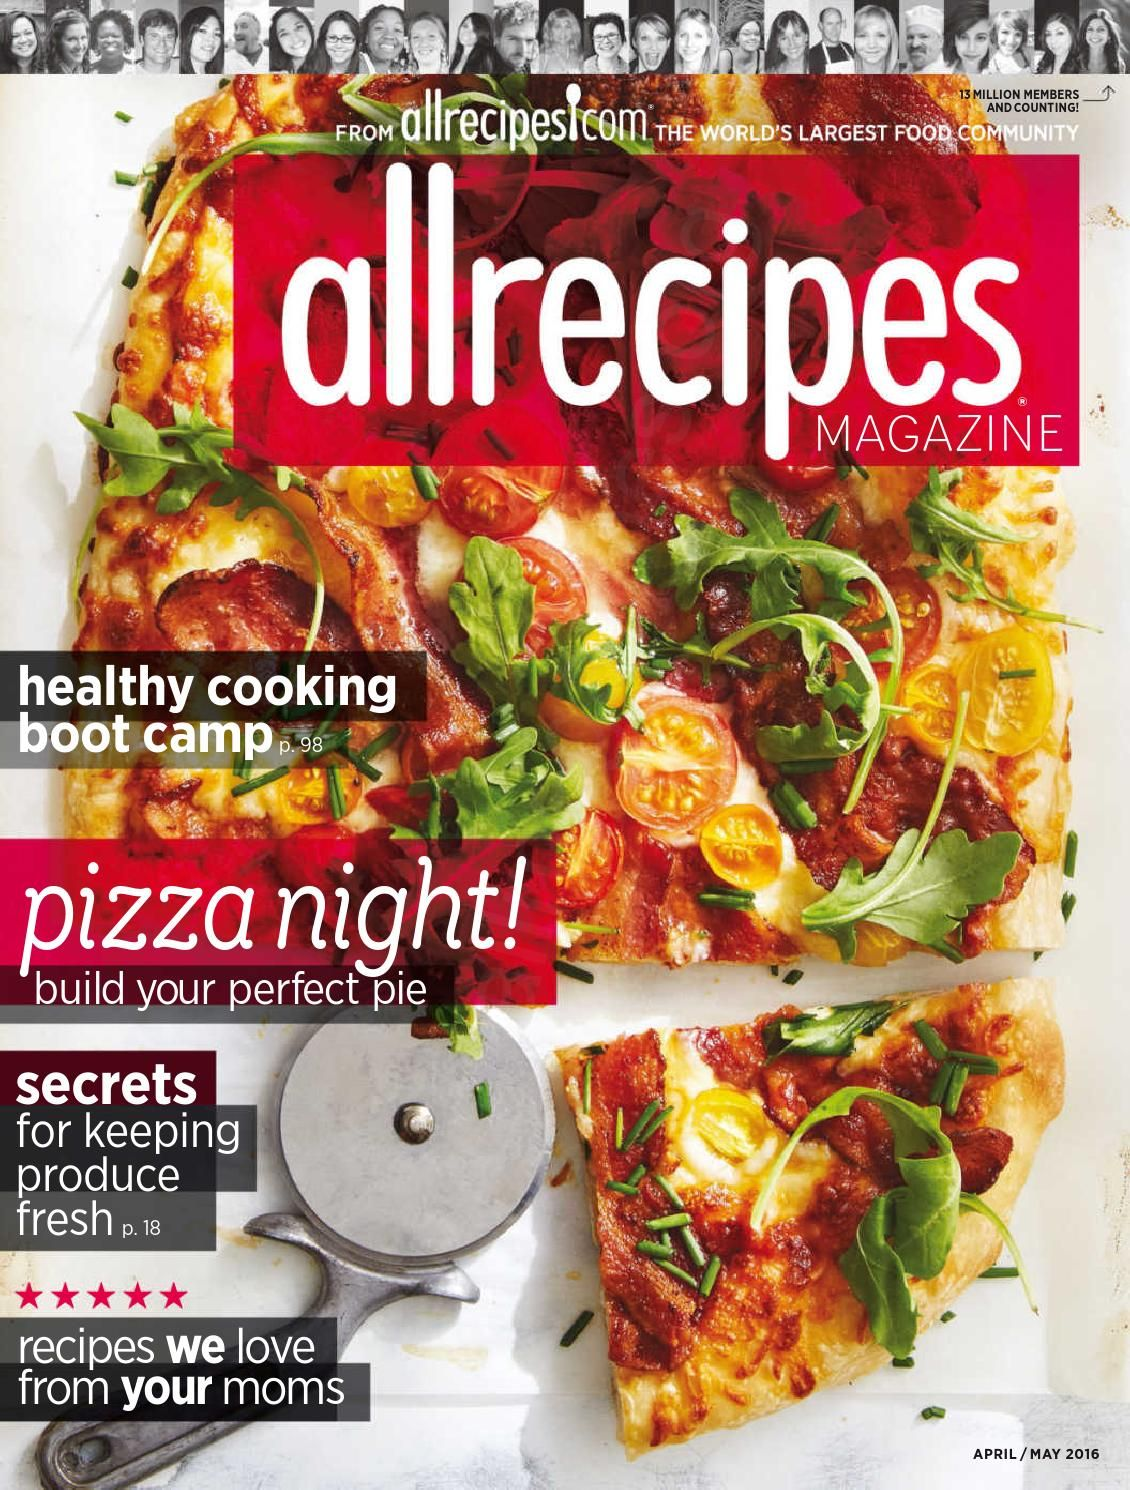 Allrecipes may 2016 allmagazines digital magazine download allrecipes may 2016 allmagazines digital magazine download pdf forumfinder Choice Image